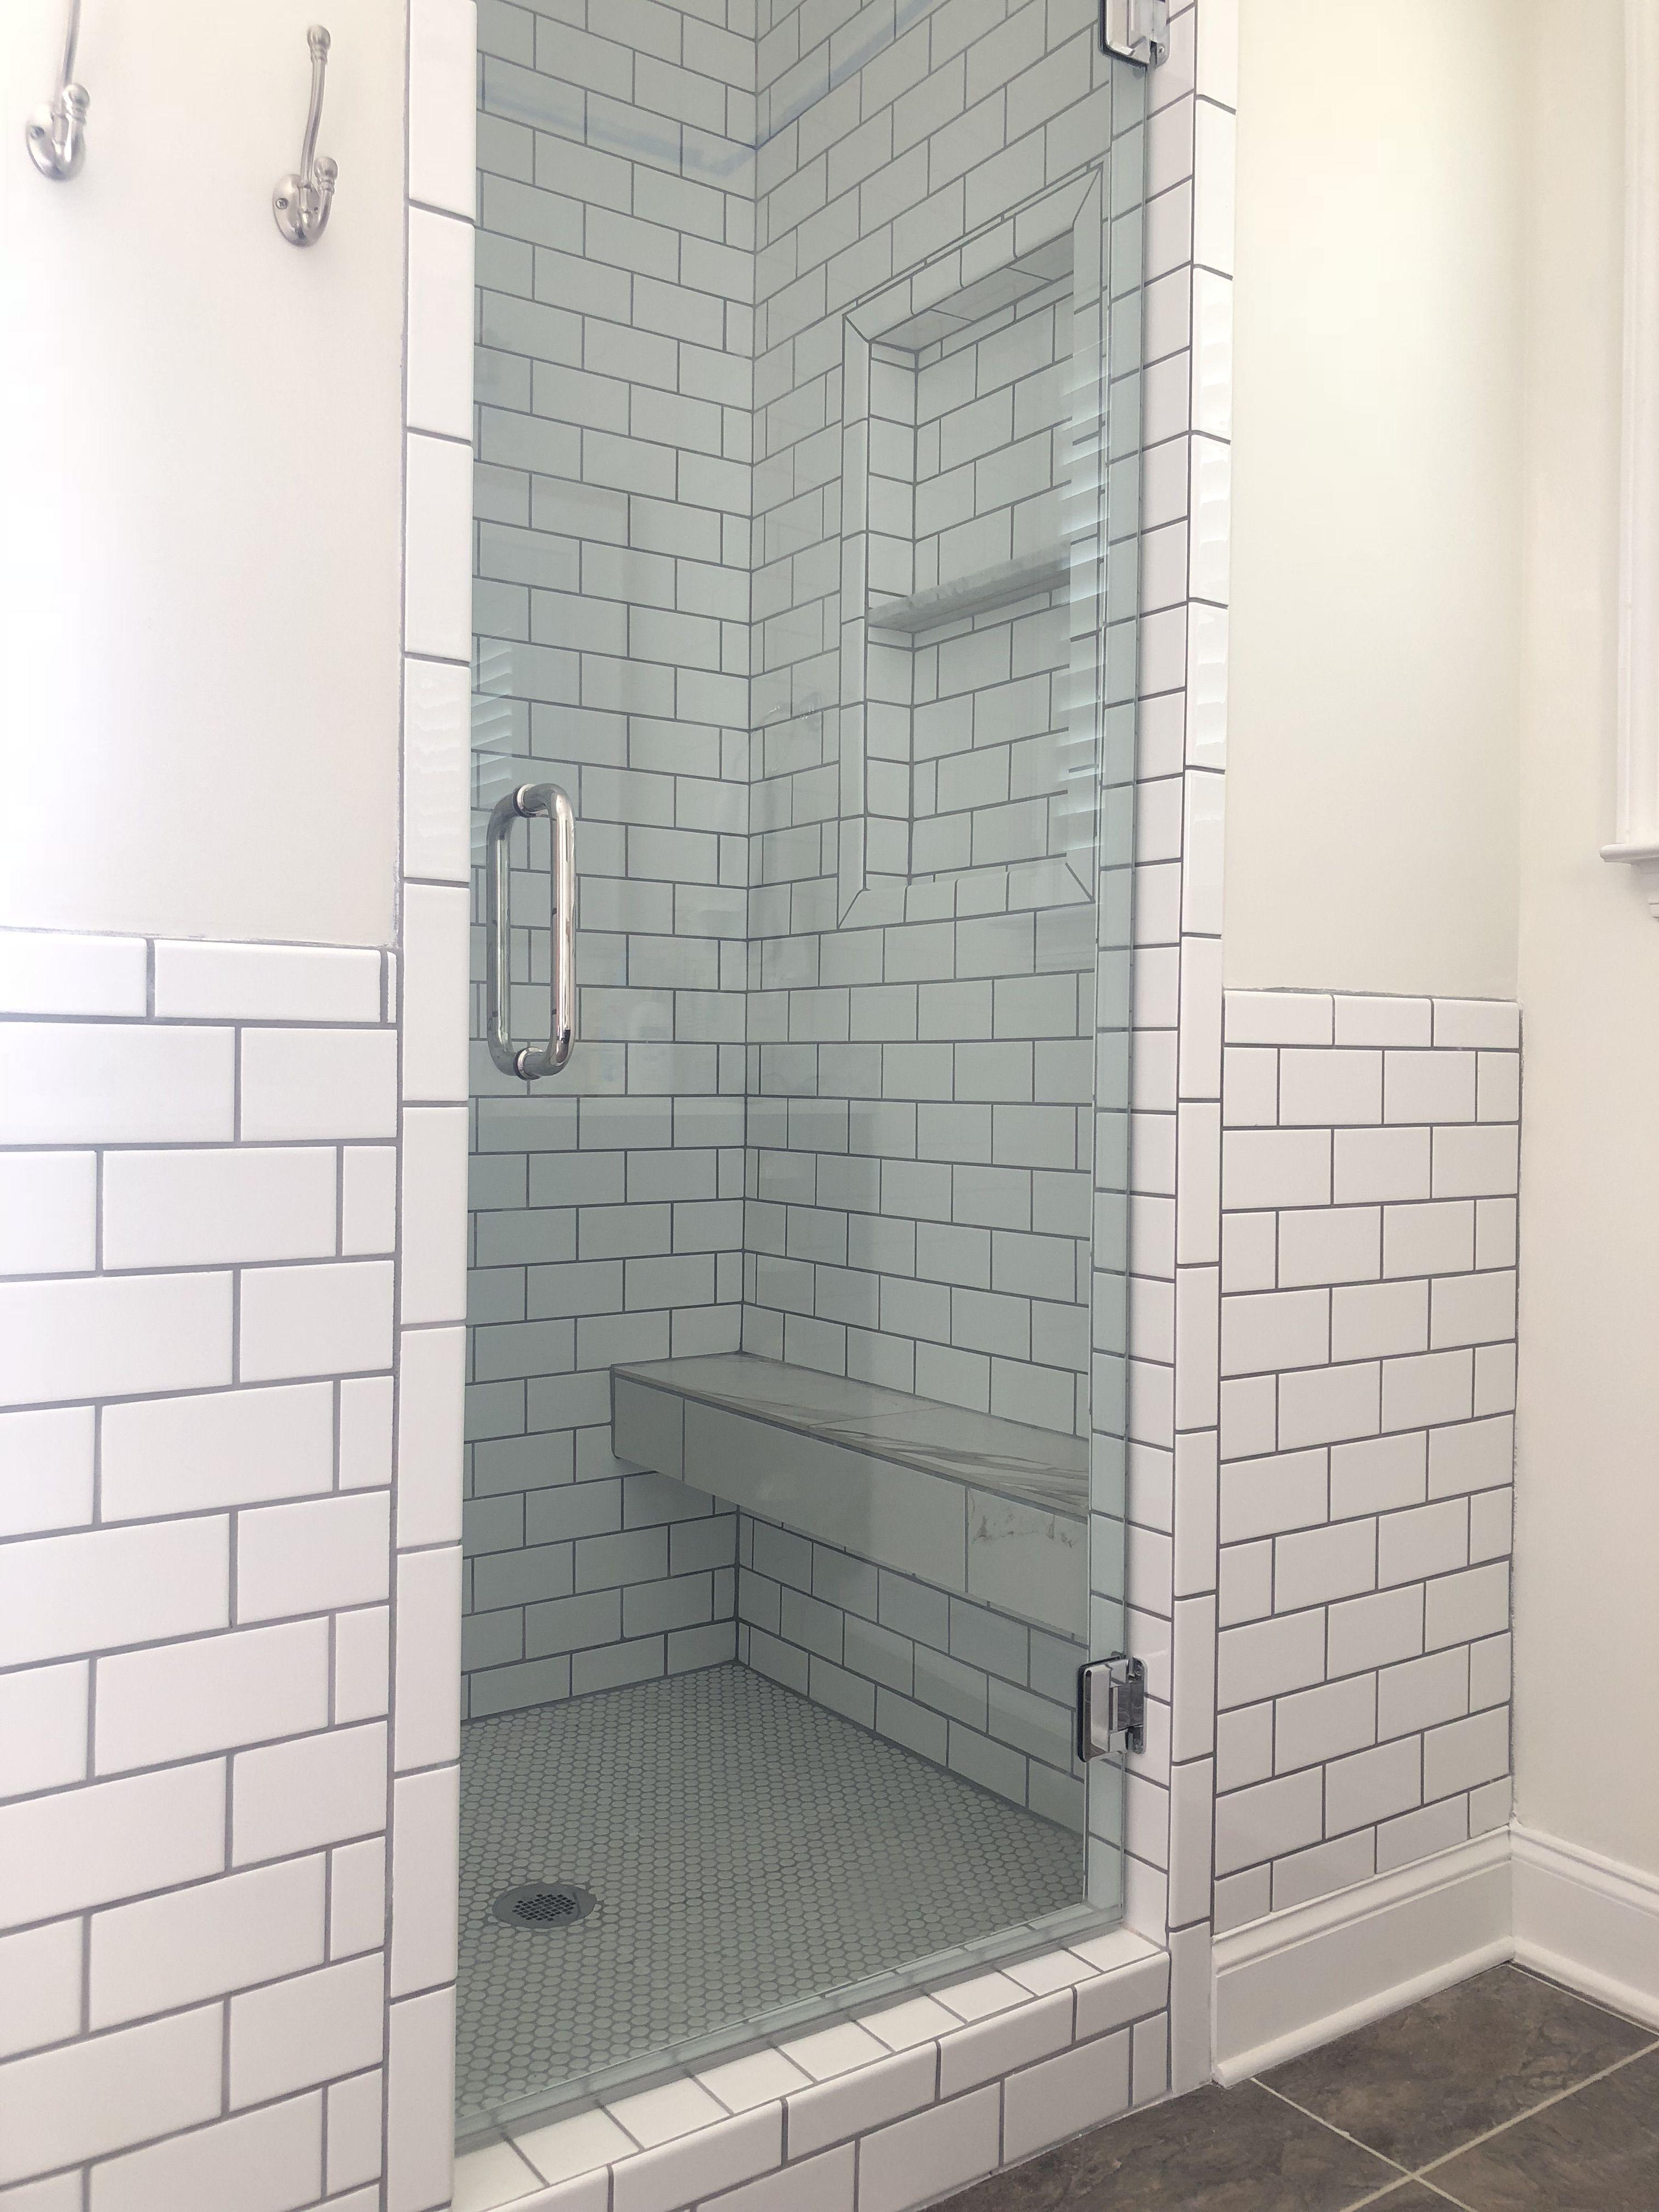 Subway Tile Shower Floating Shower Bench Shampoo Bar Our Next